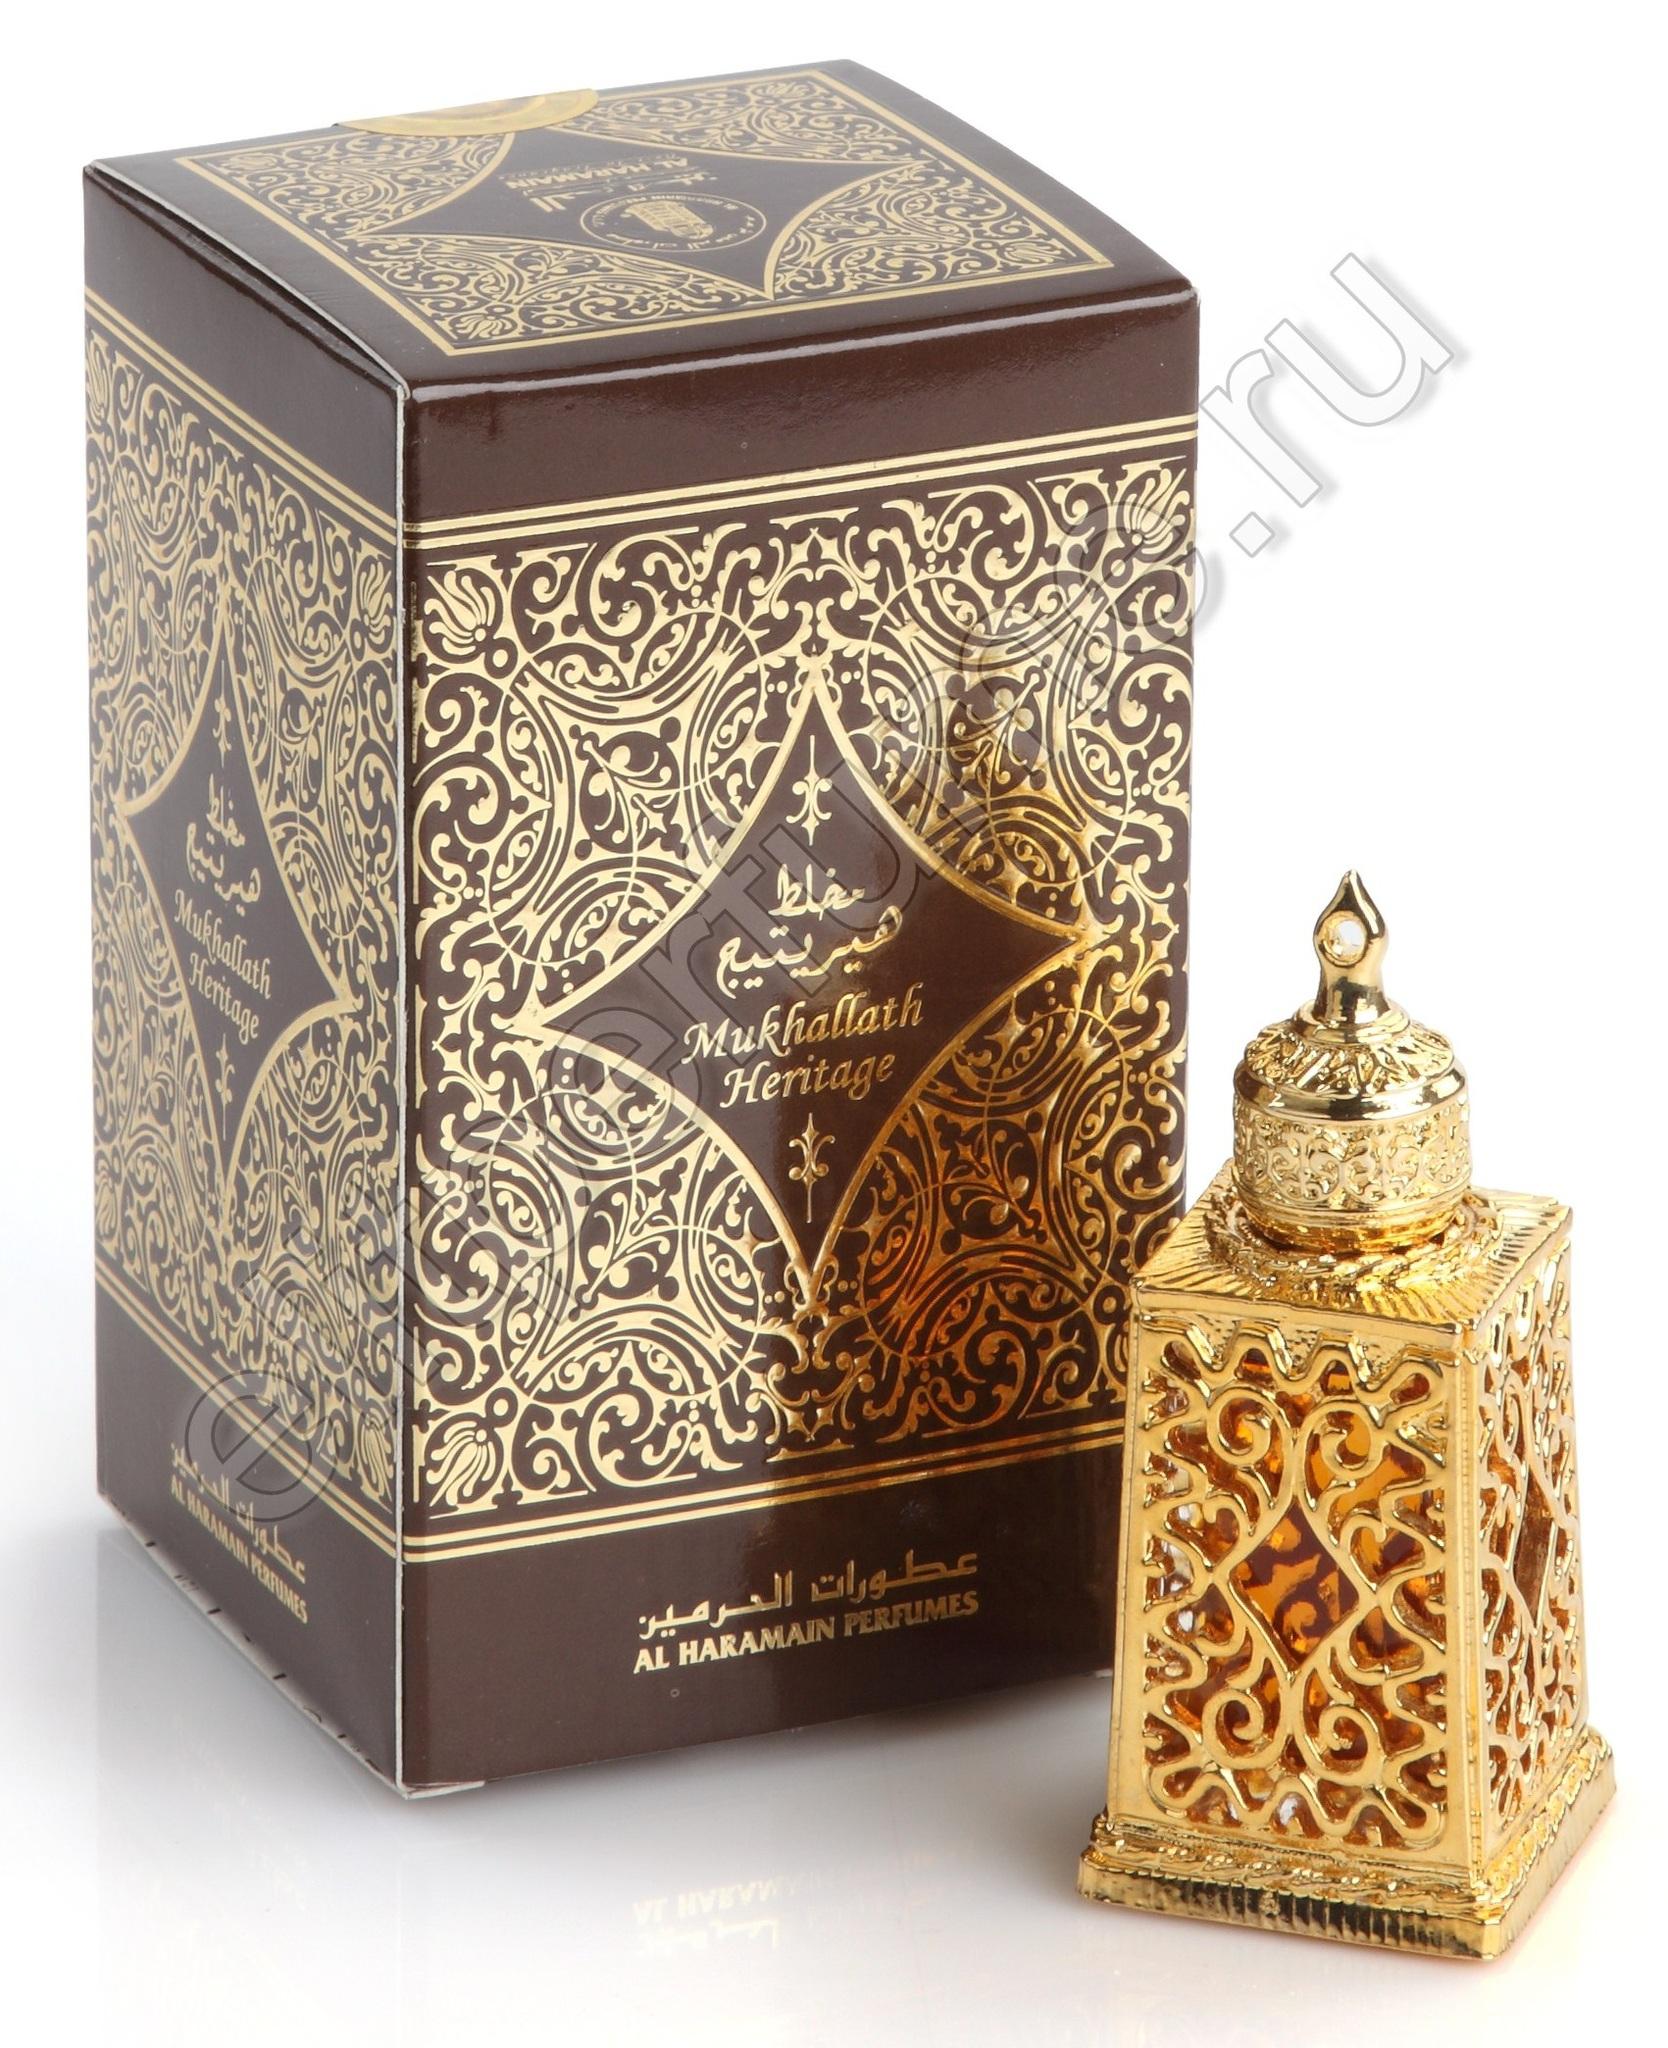 Мухаллат Херитейдж Mukhallath Heritage 12 мл арабские масляные духи от Аль Харамайн Al Haramain Perfumes